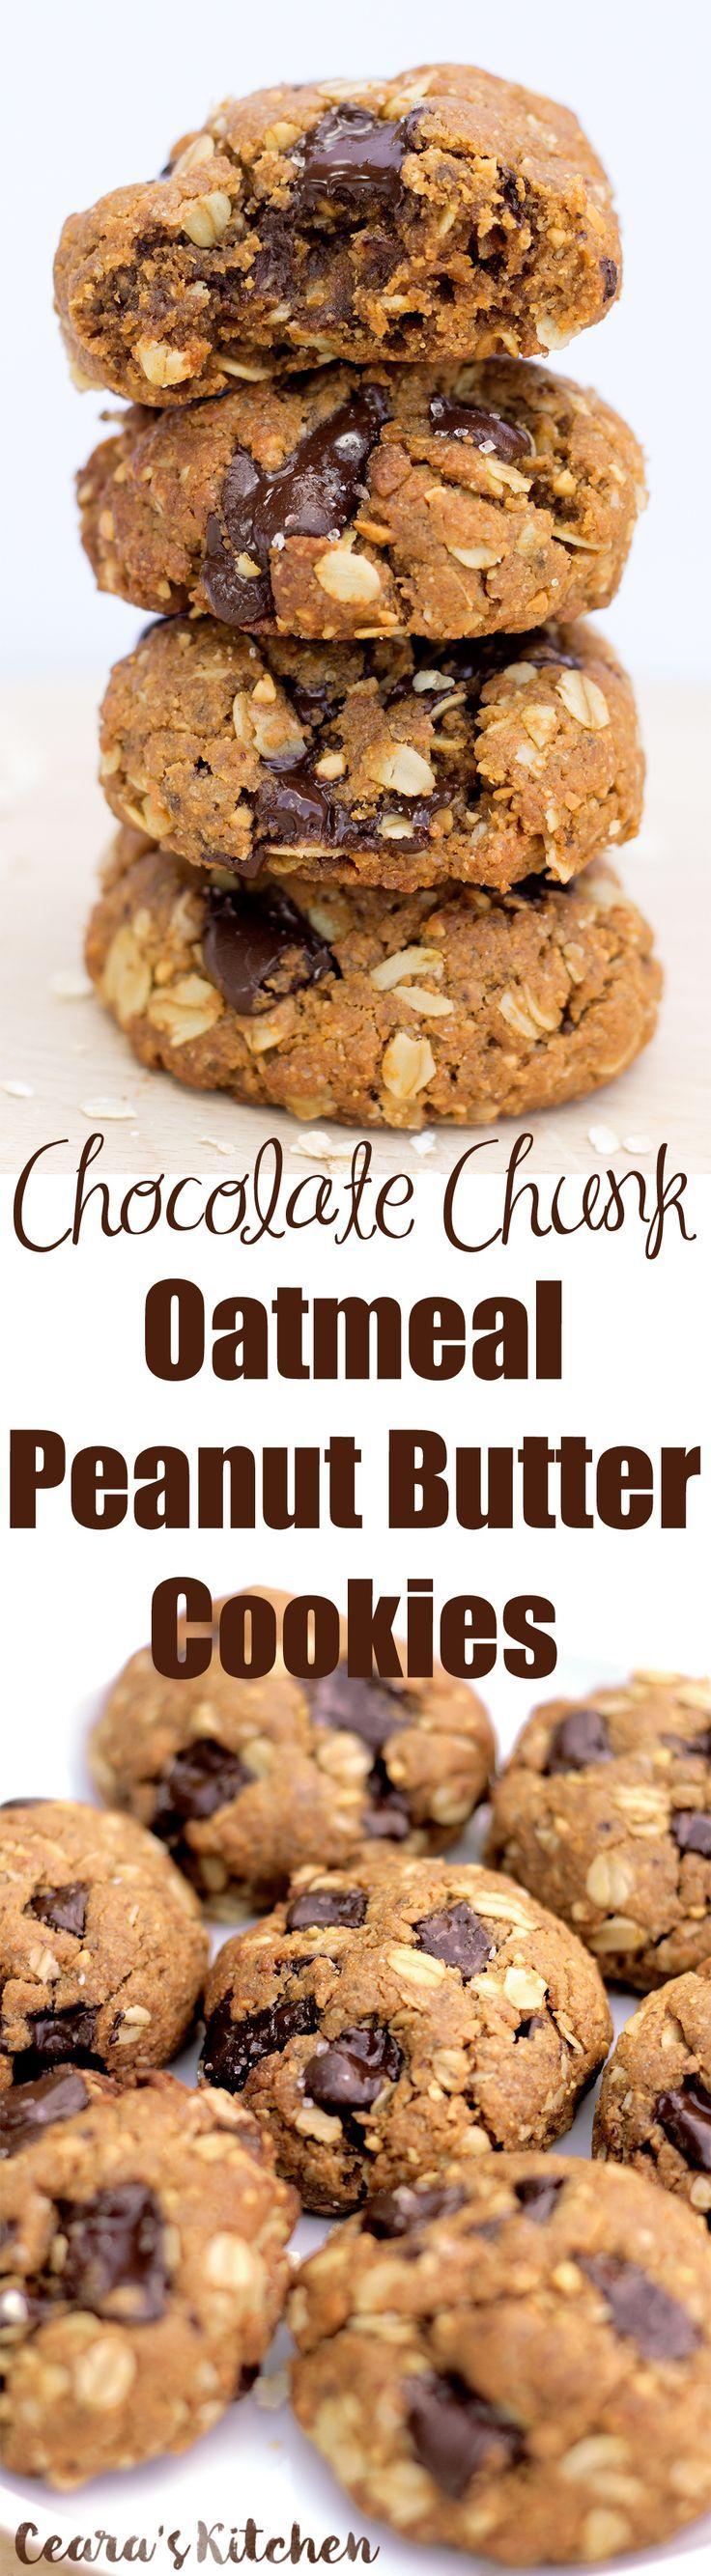 Best 25+ Oatmeal peanut butter cookies ideas on Pinterest ...